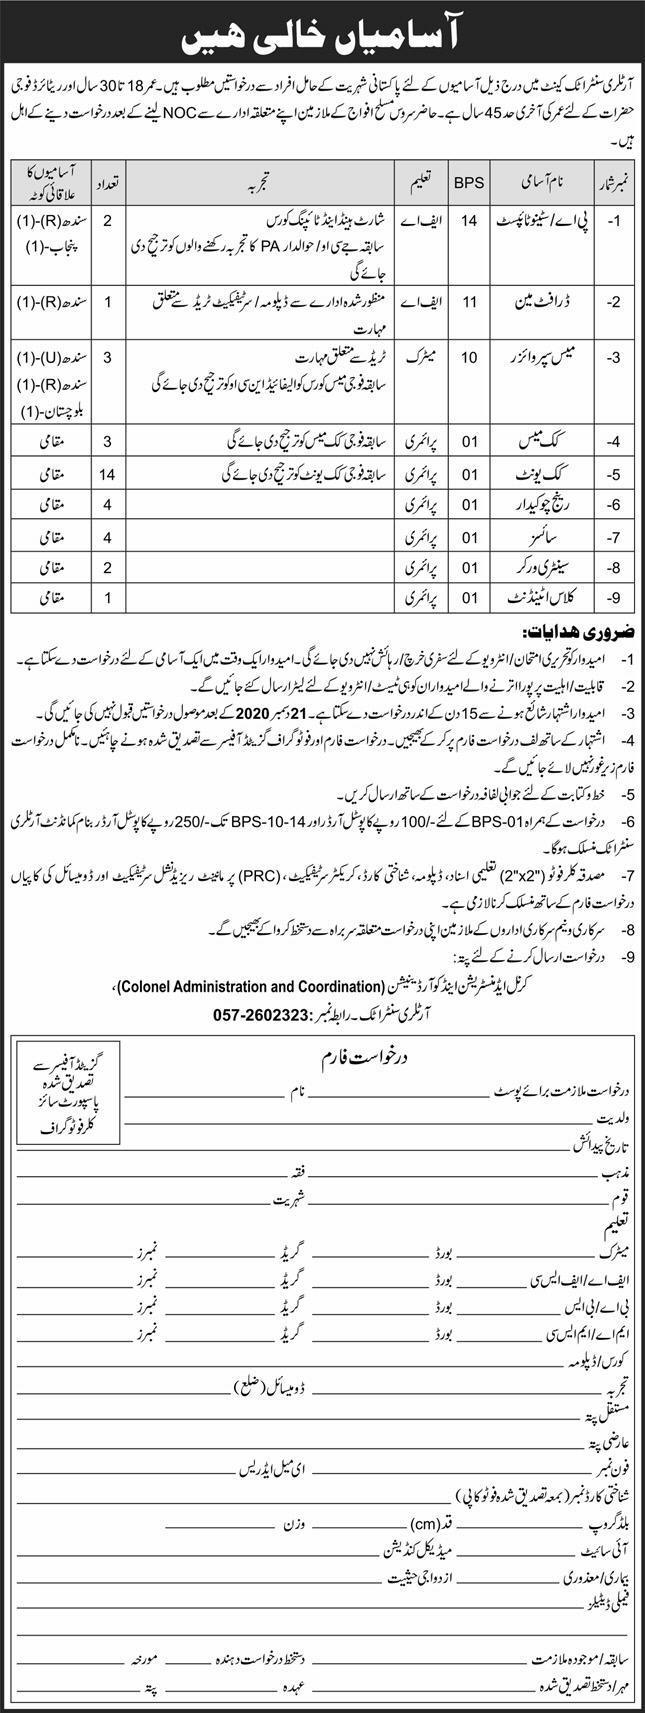 Latest Pakistan Army Artillery Center Attock Jobs 2020